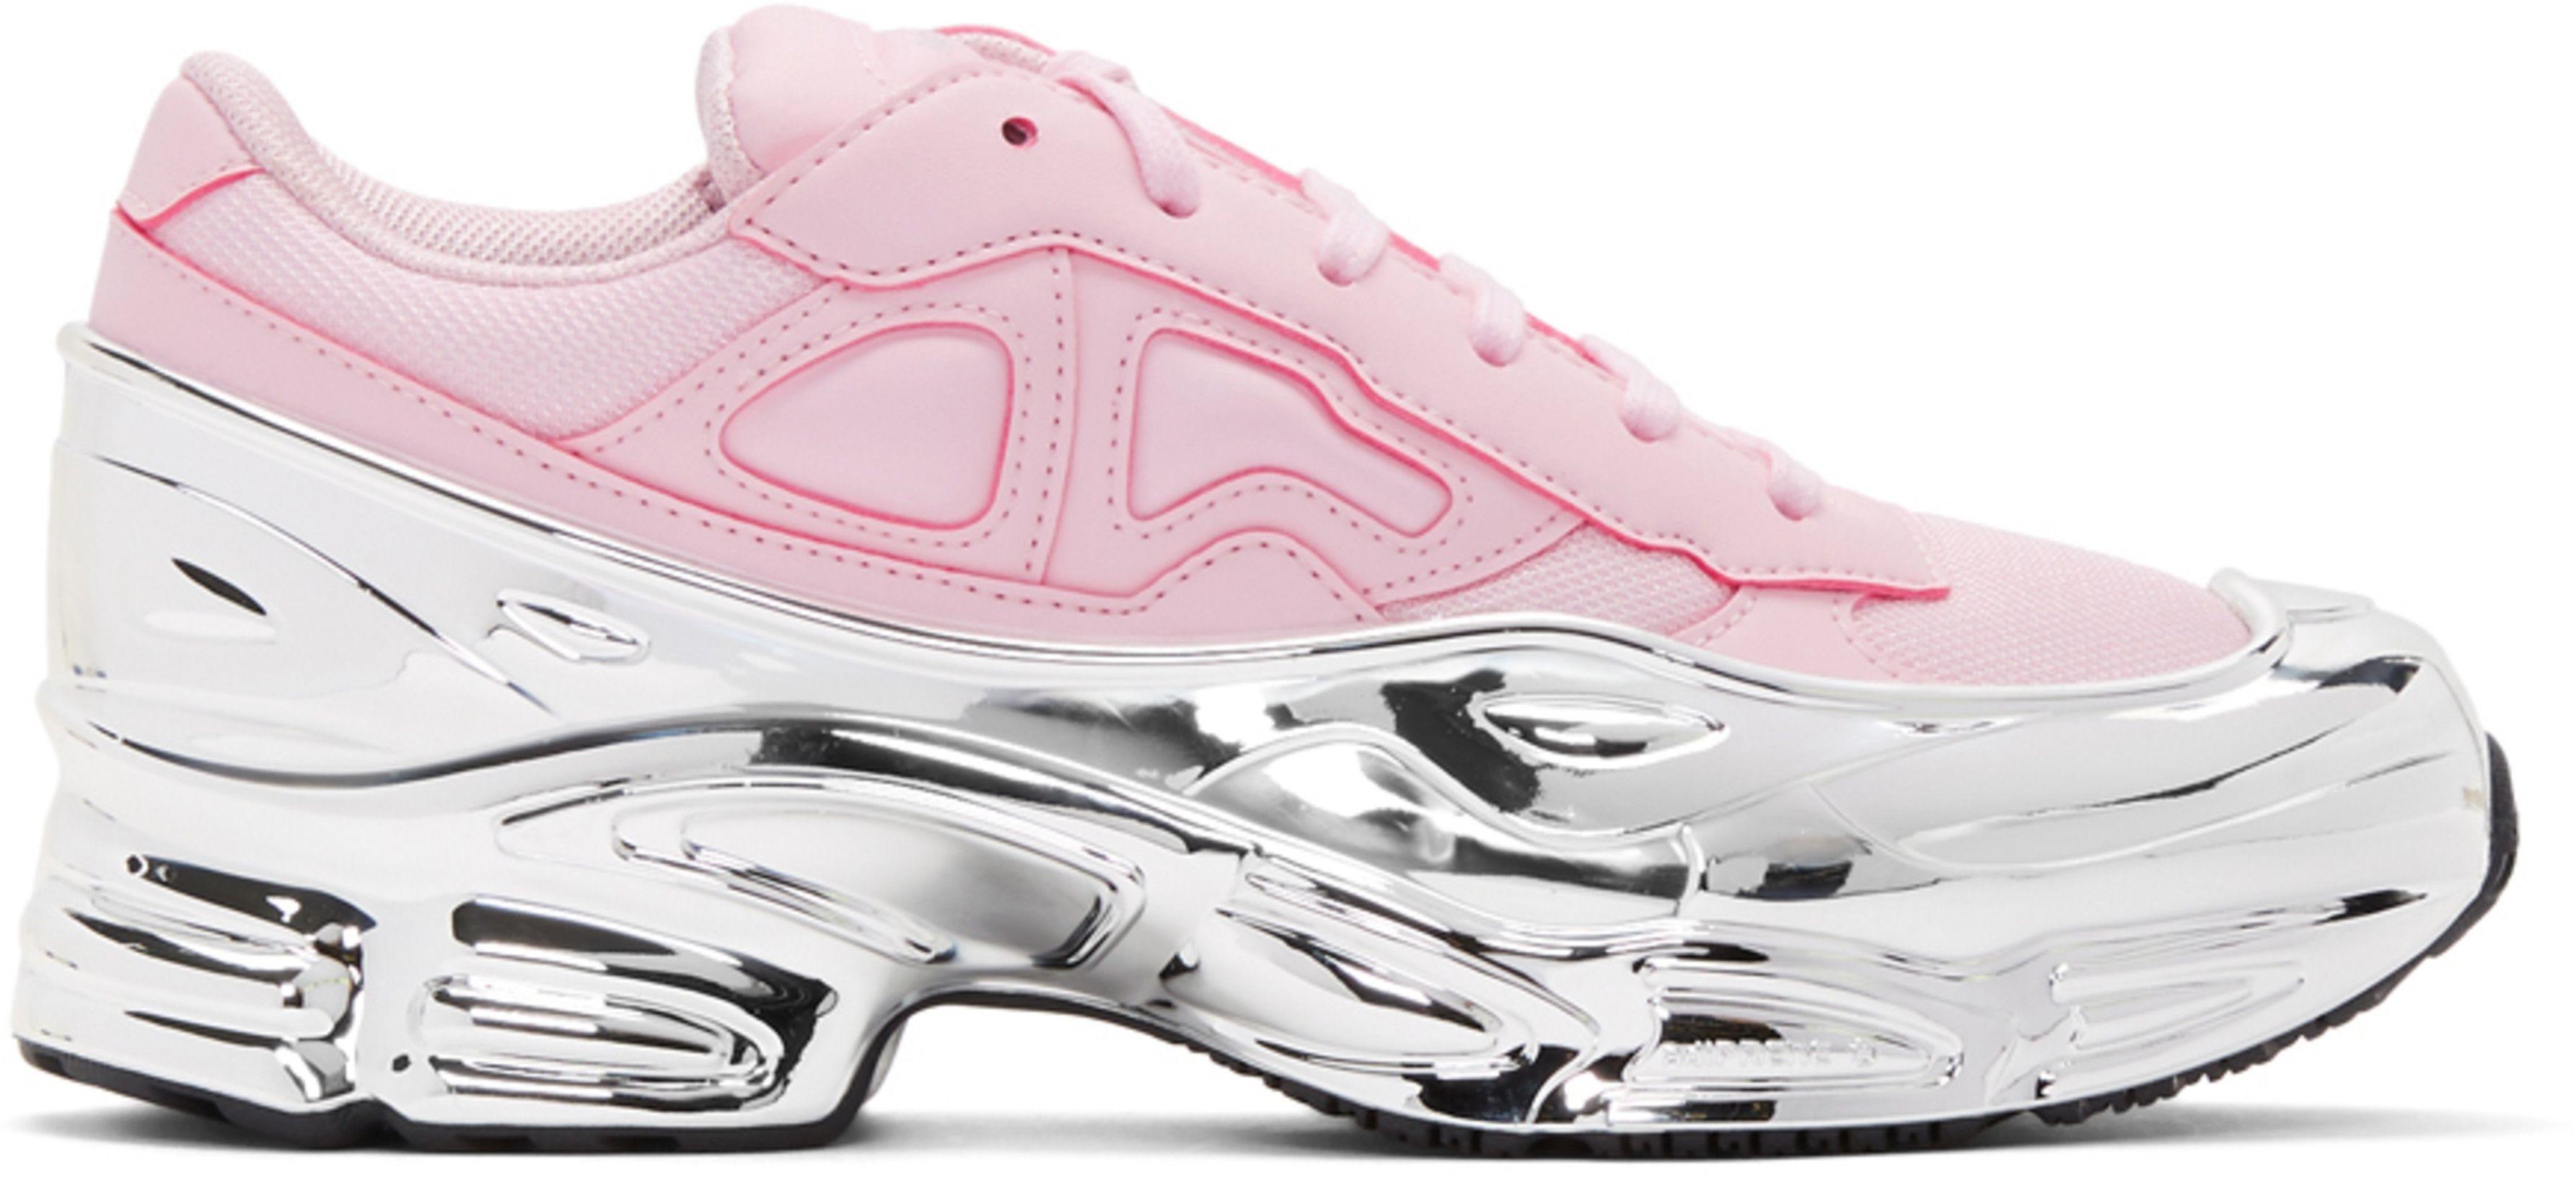 Sneakers, Raf simons adidas, Air max